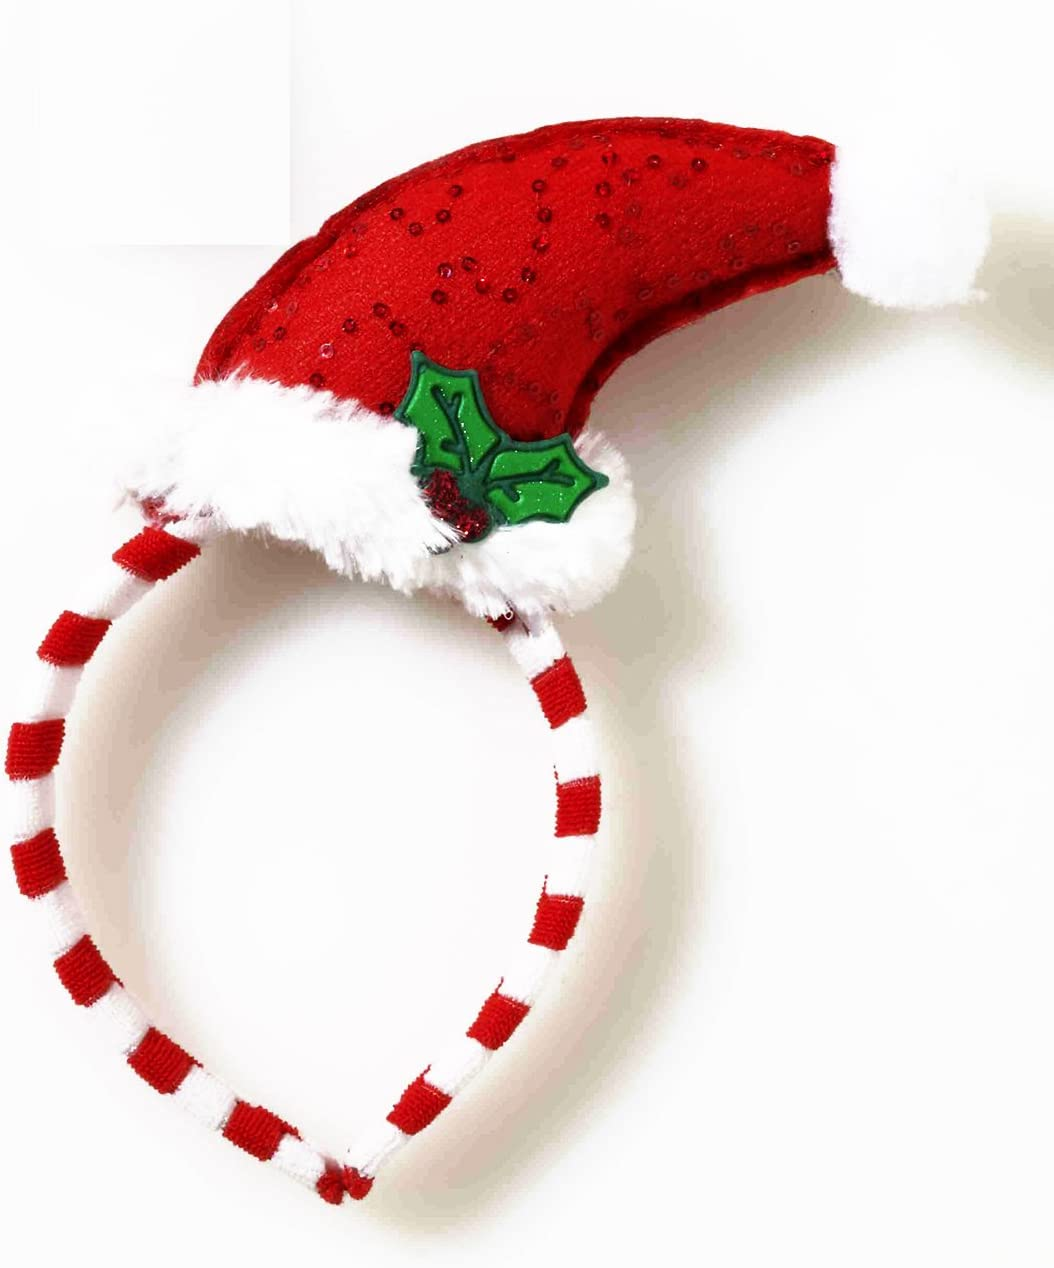 STRIPED MINI SANTA HAT HEADBAND Christmas Holiday Costume Party Adult 2-4A